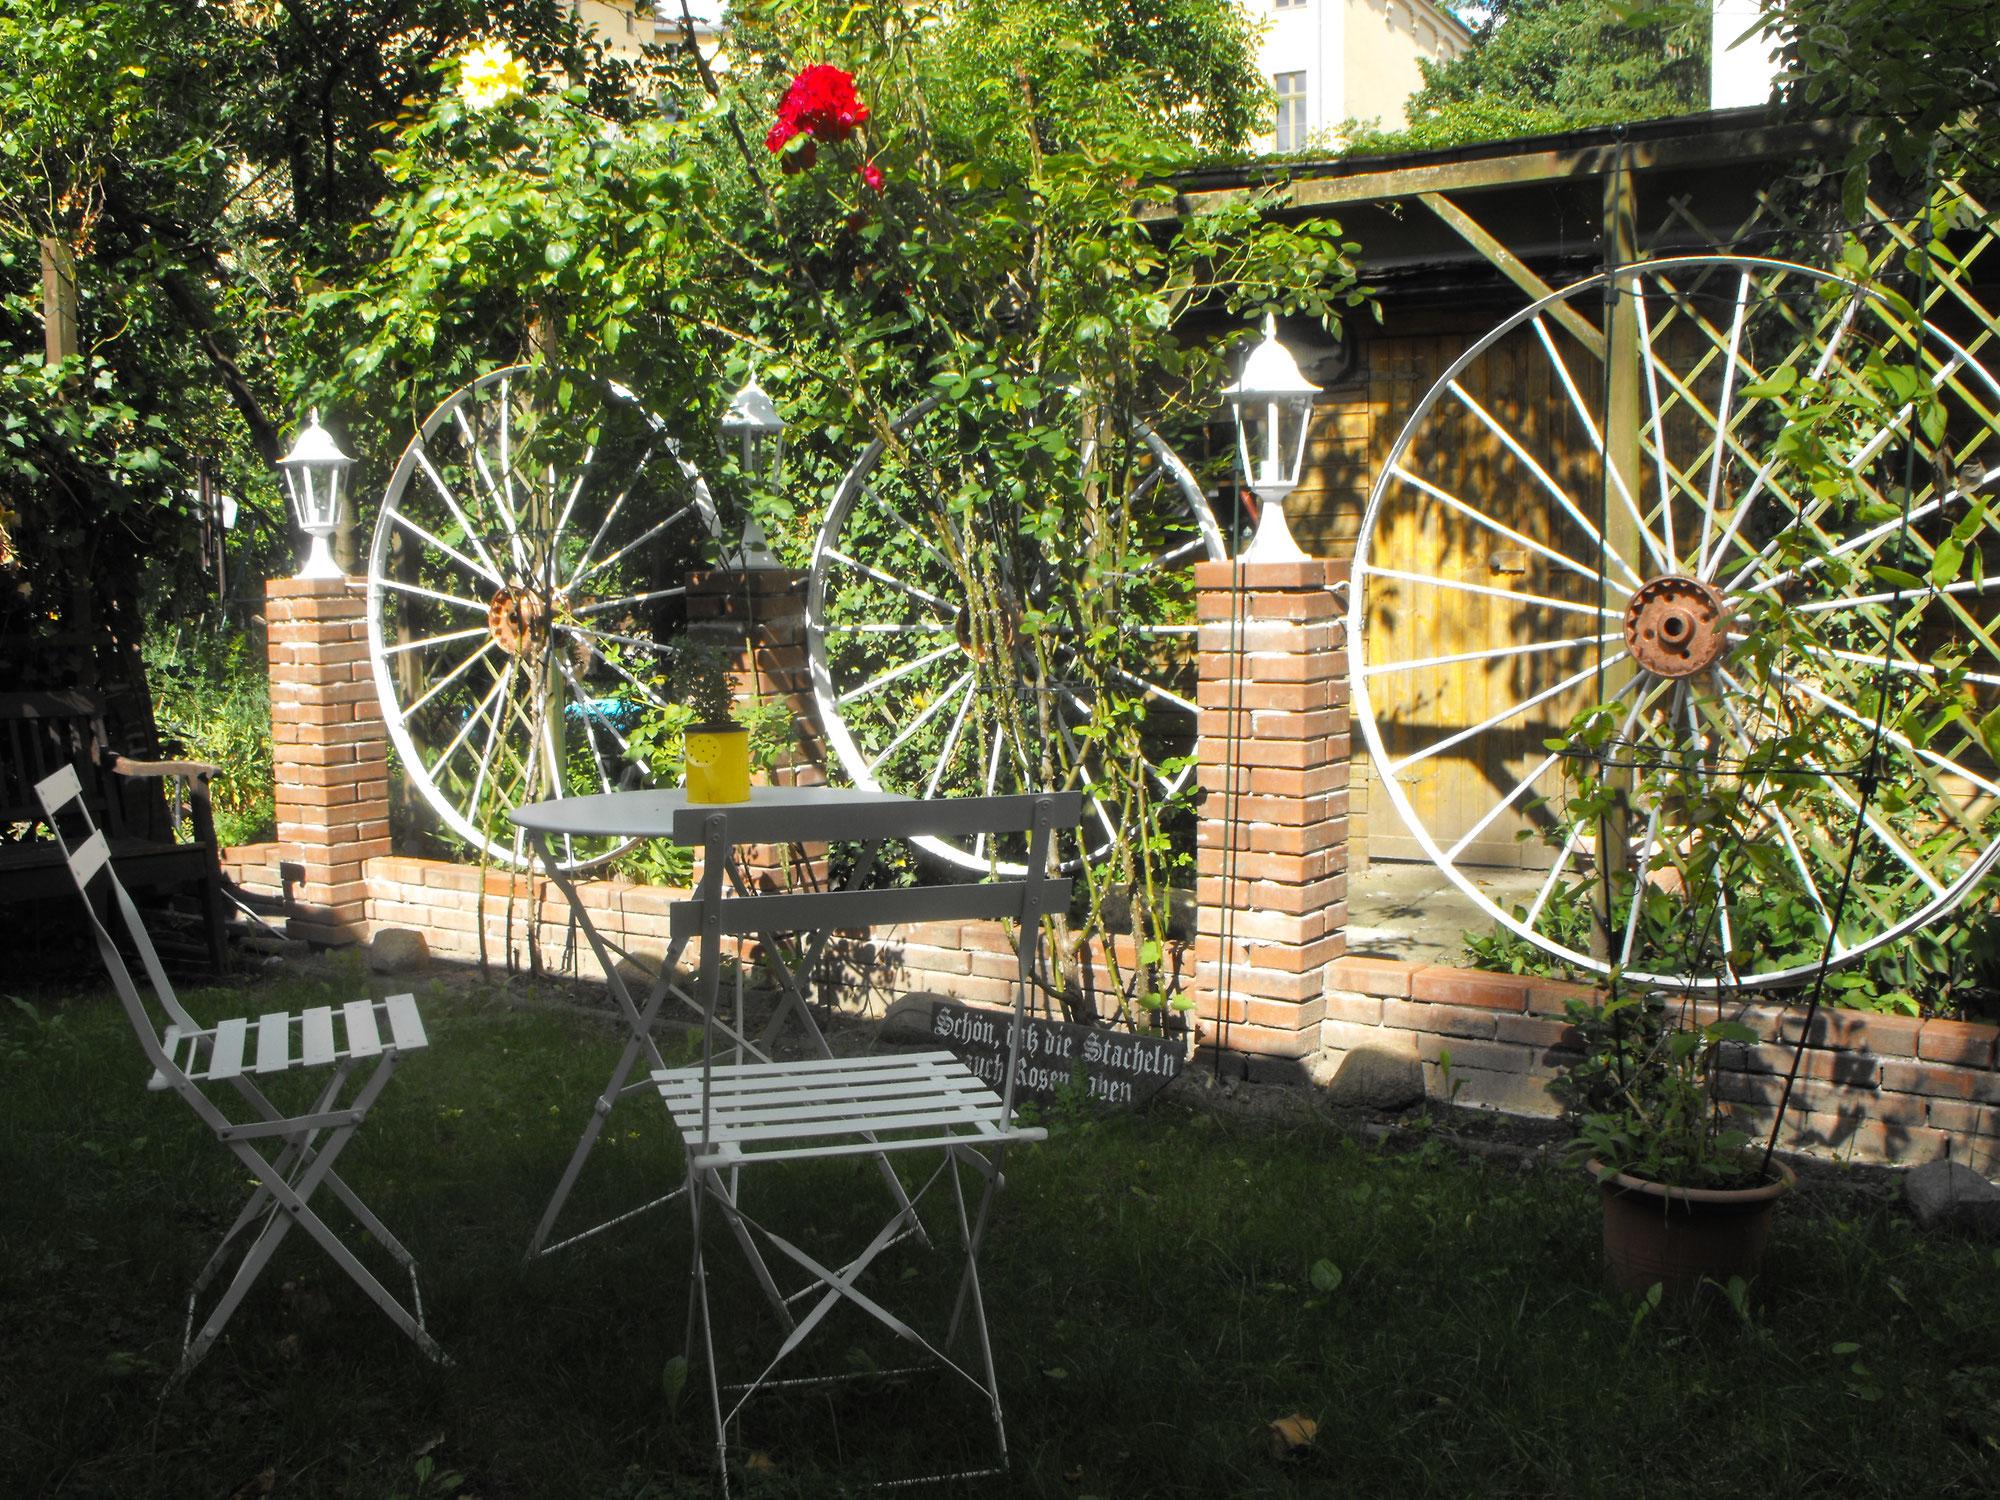 preise pension sanssouci holidays in potsdam. Black Bedroom Furniture Sets. Home Design Ideas